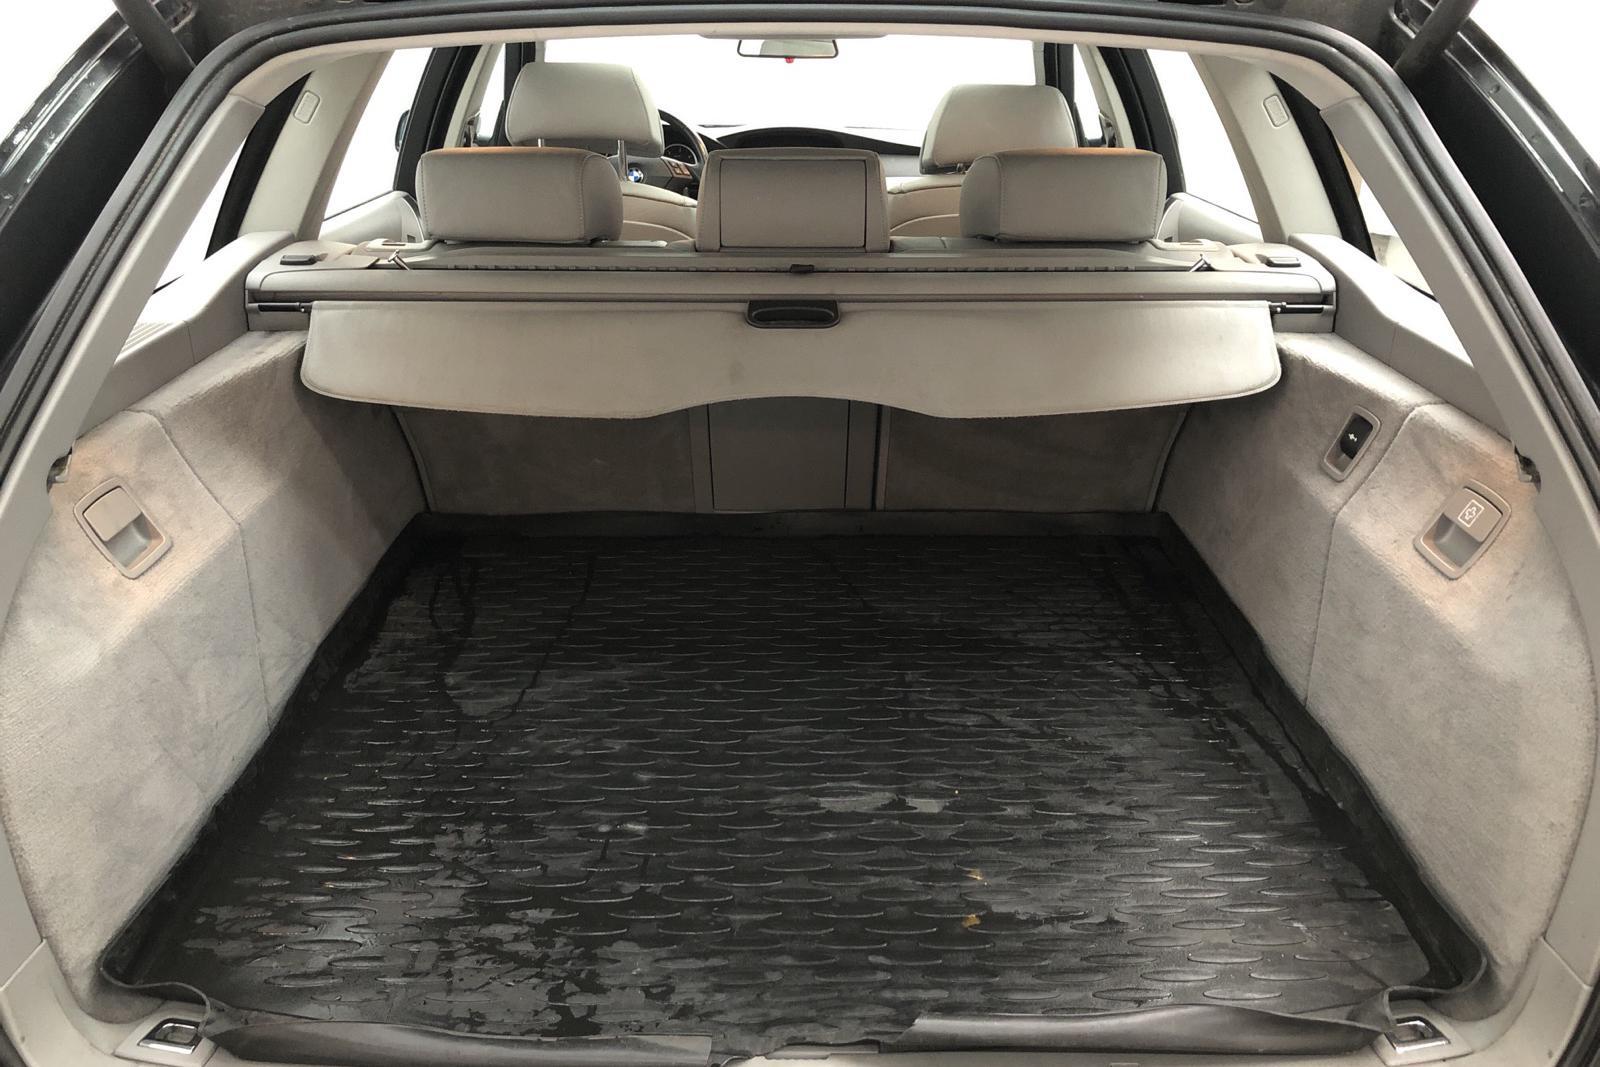 BMW 530xd Touring, E61 (231hk) - 198 000 km - Automatic - black - 2006